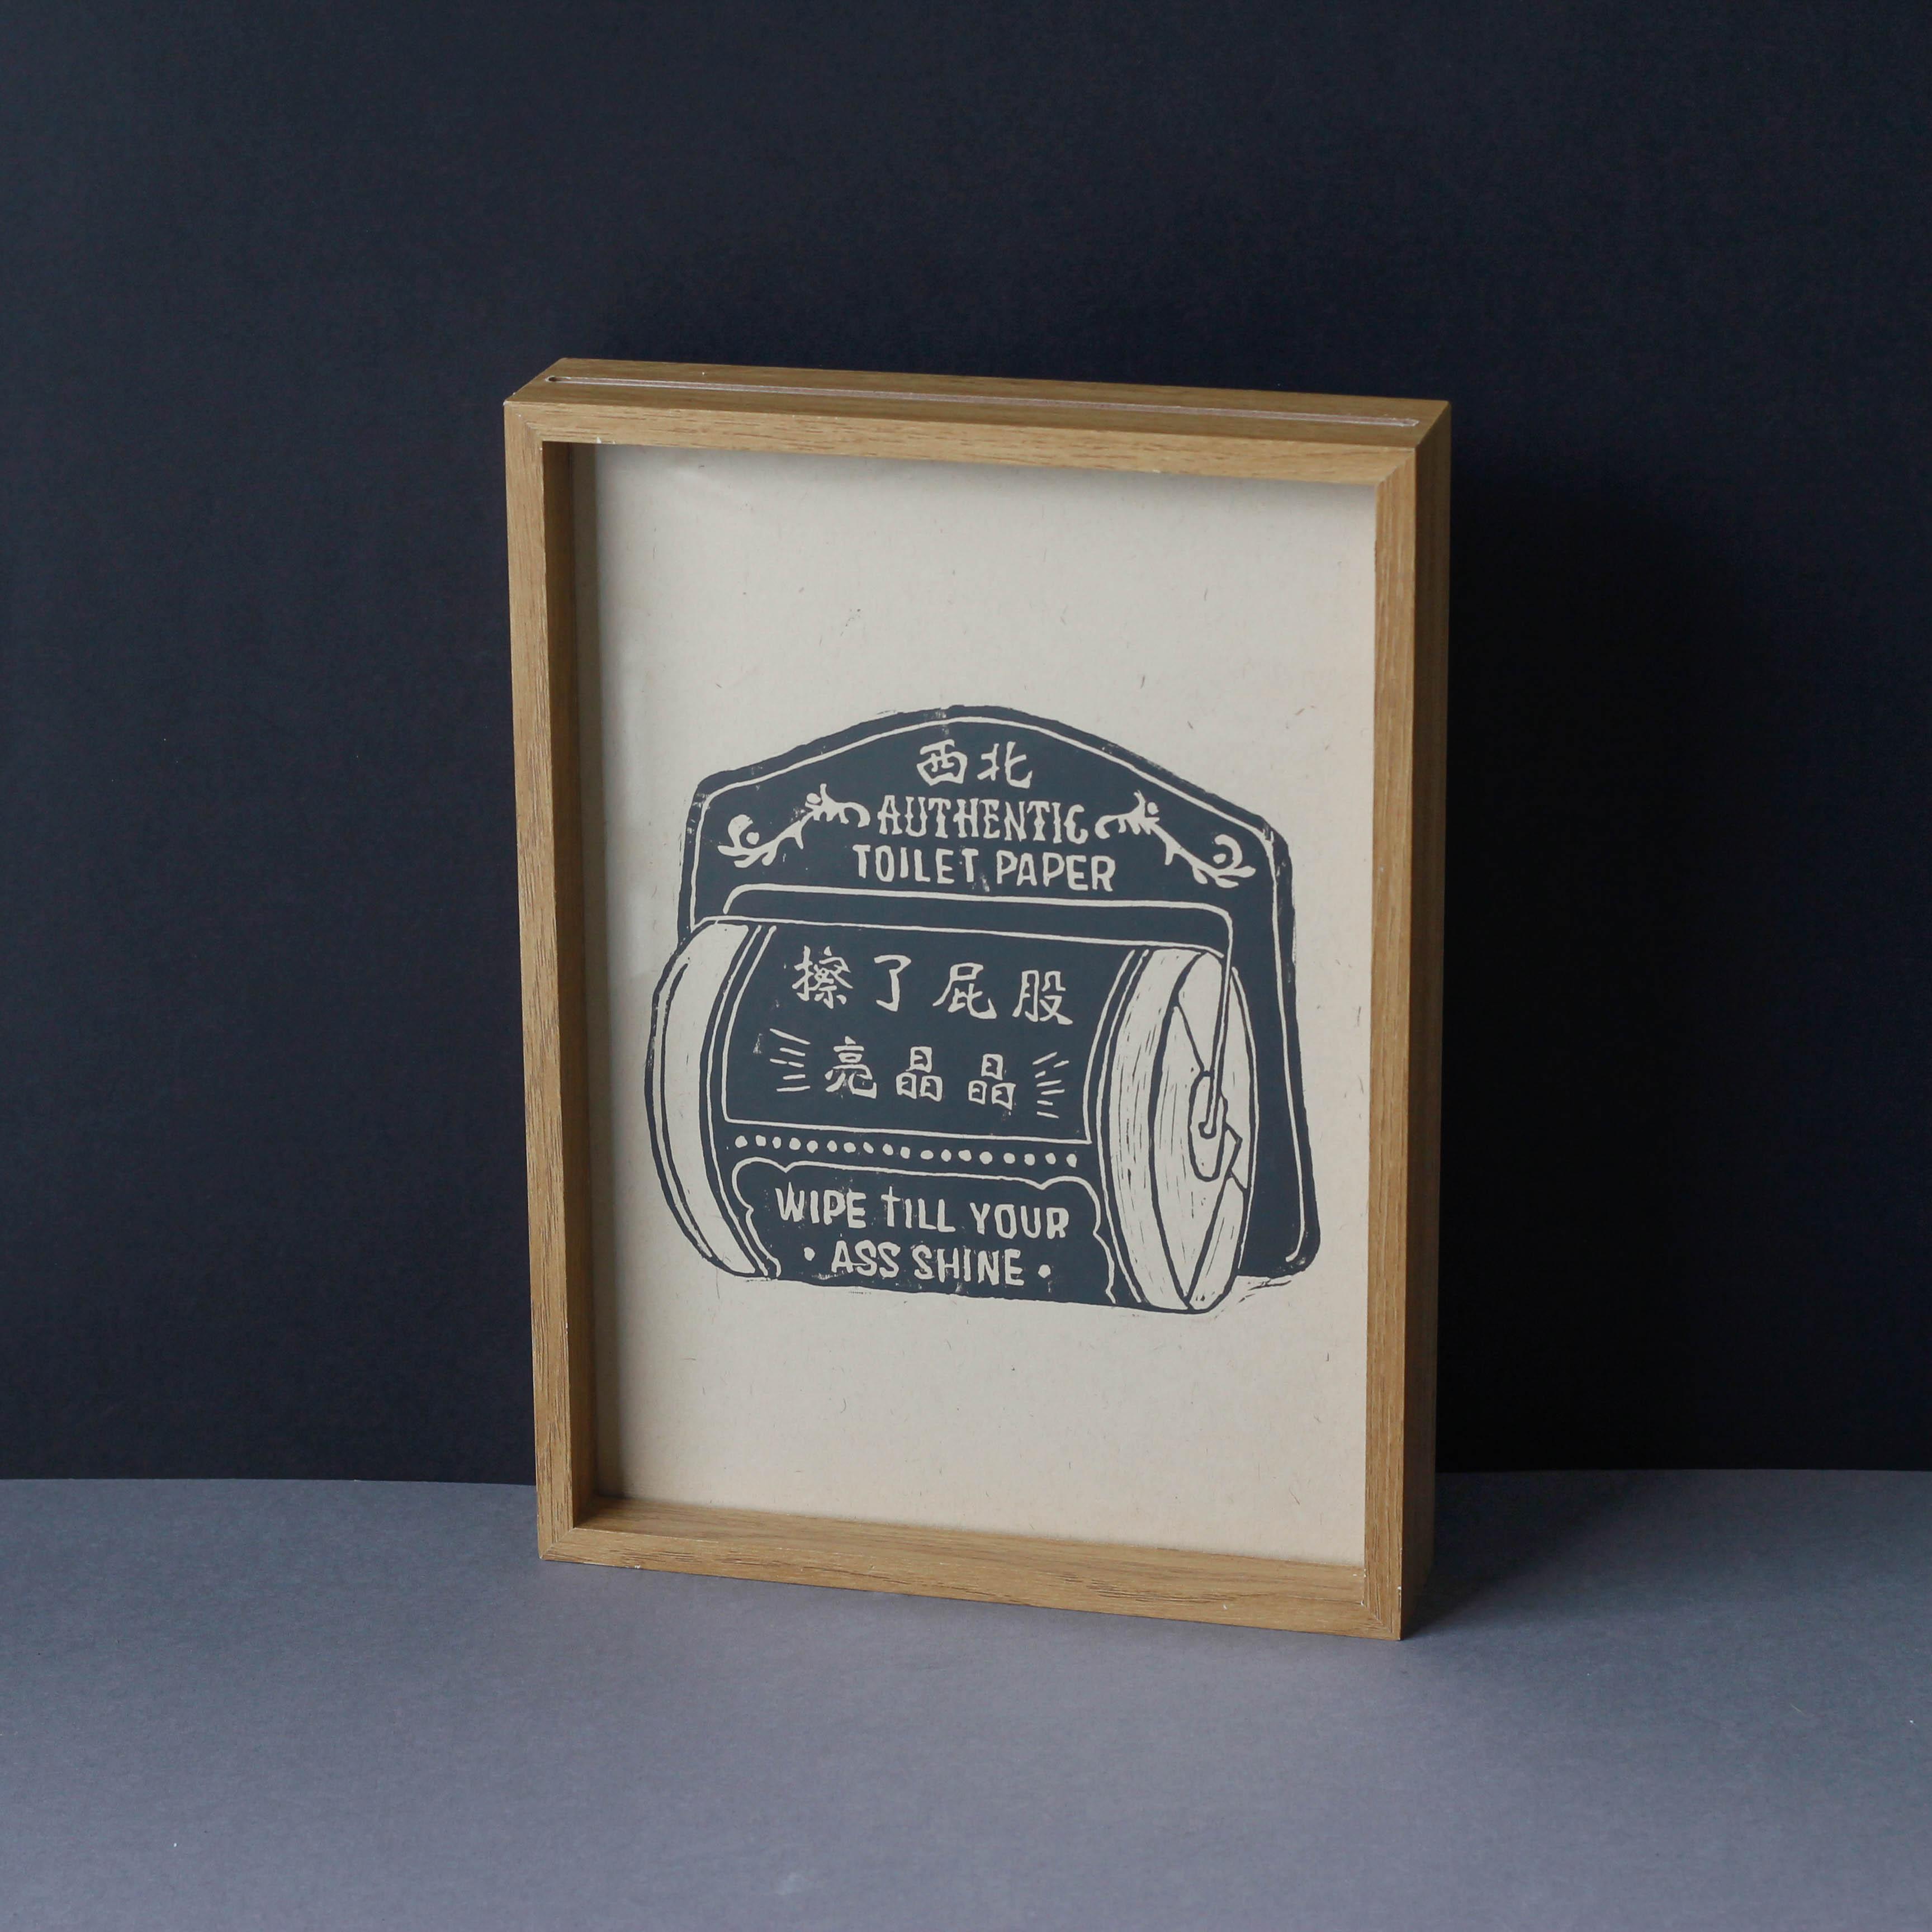 Sibei Authentic - Toilet Paper Linocut